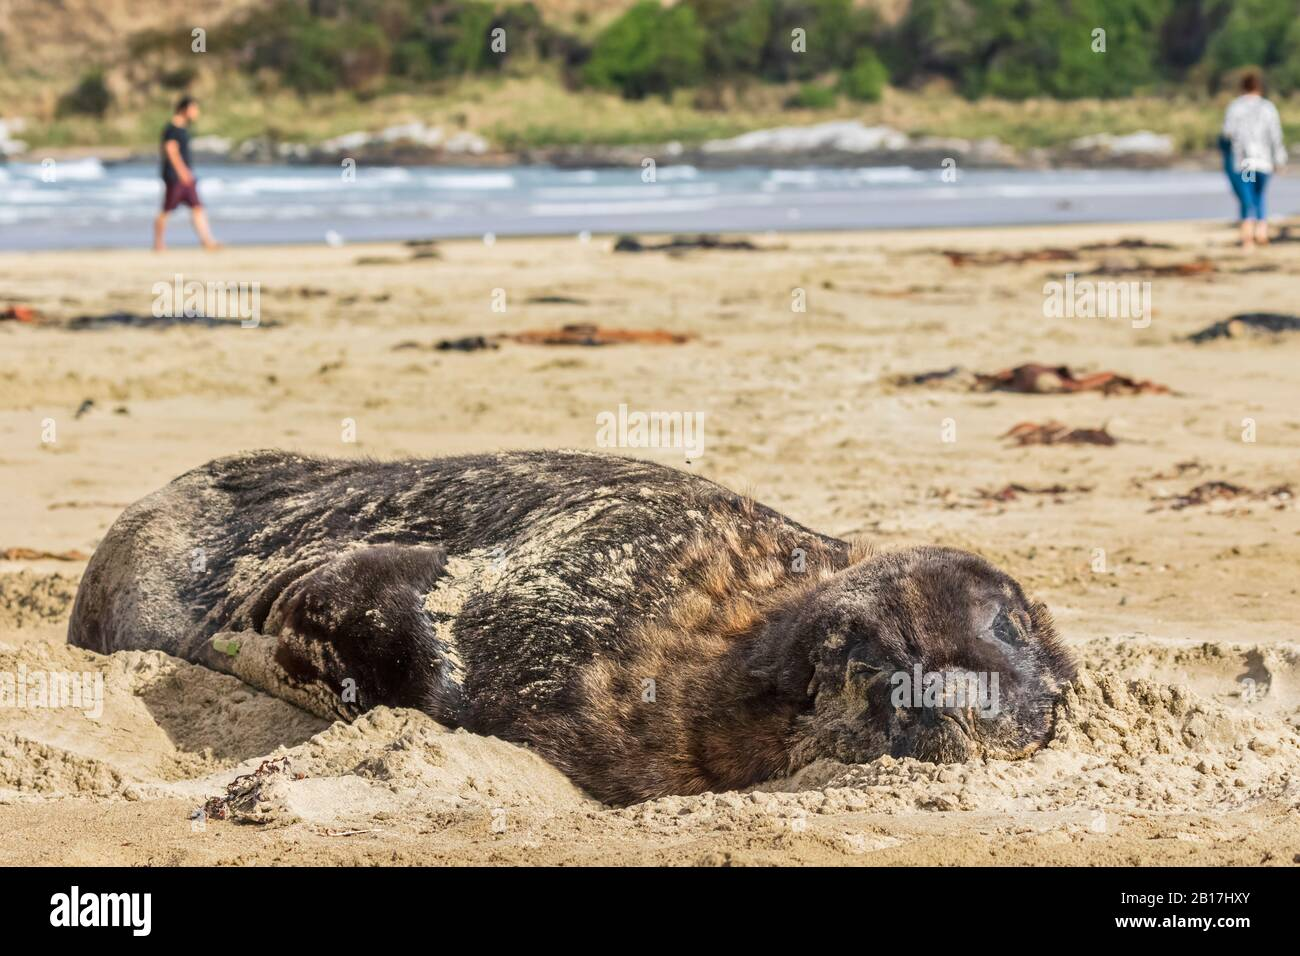 New Zealand, Oceania, South Island, Otago, Southeast, Catlins Coast, New Zealand Sea Lion (Phocarctos hookeri) lying in sand in Purakaunui Bay Stock Photo